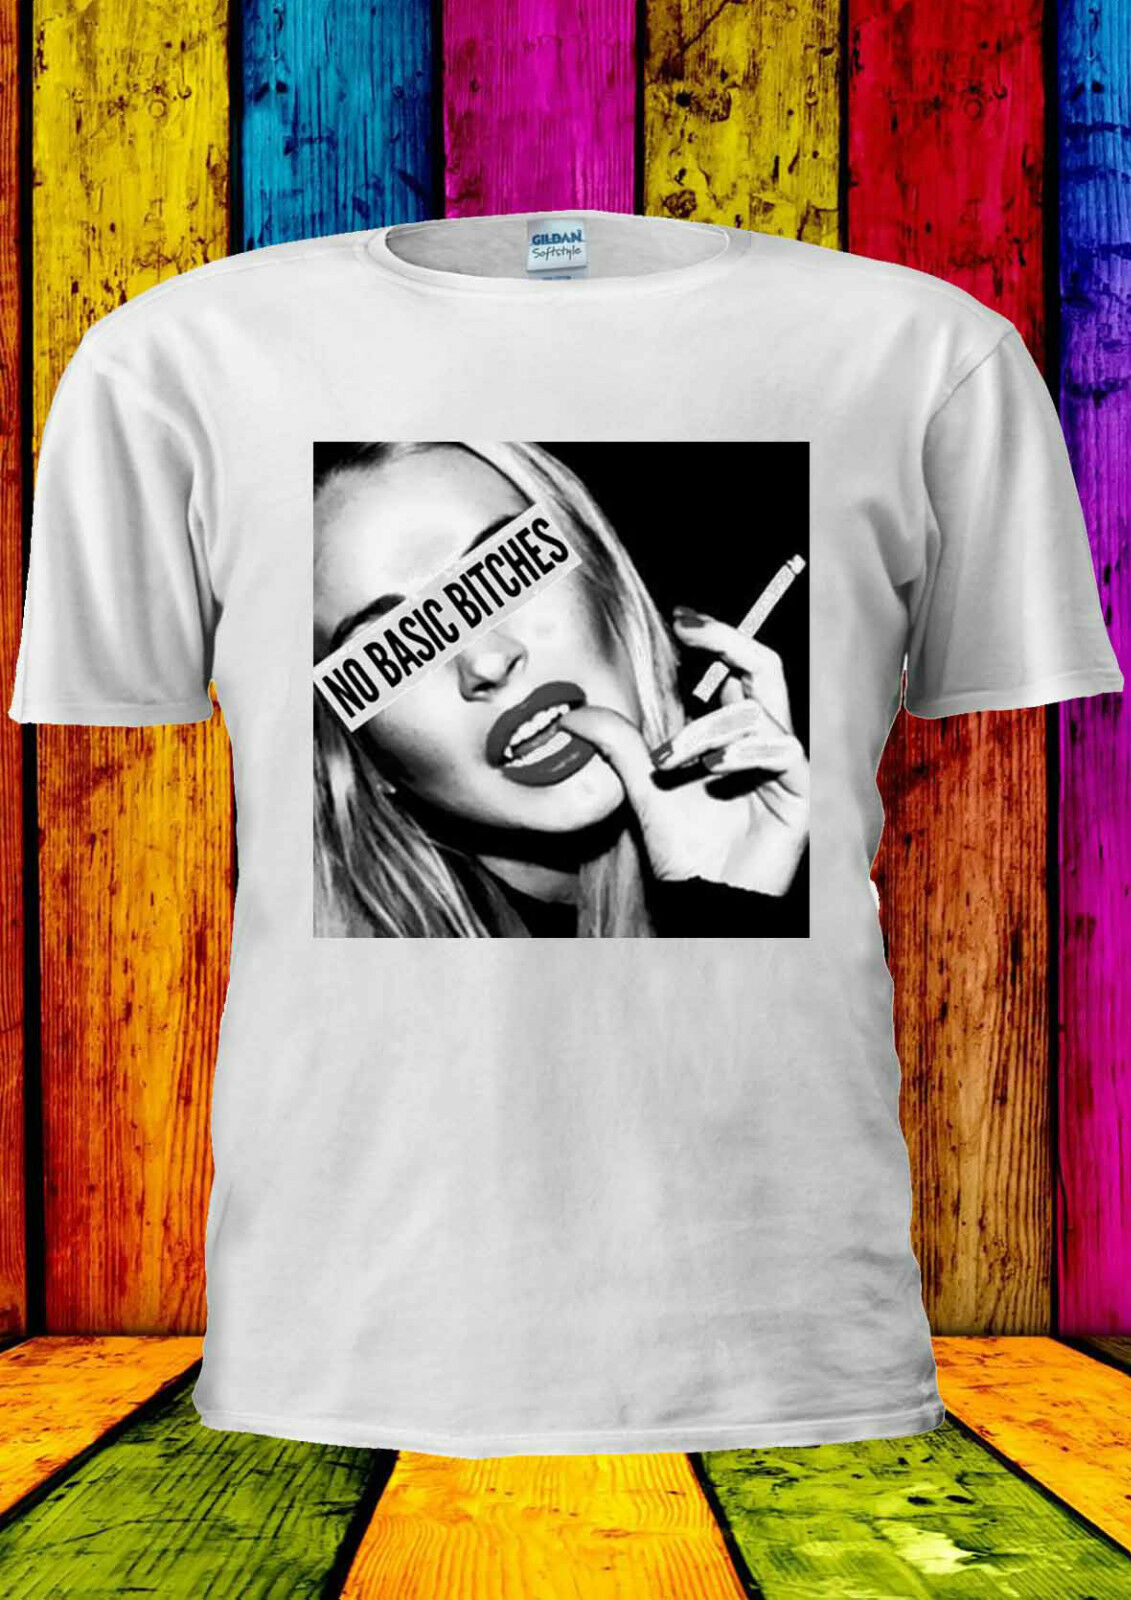 No básico B * Tches Smoking camiseta de Instagram chaleco camiseta sin mangas hombres mujeres Unisex 1706 tamaño Unisex S-3Xl